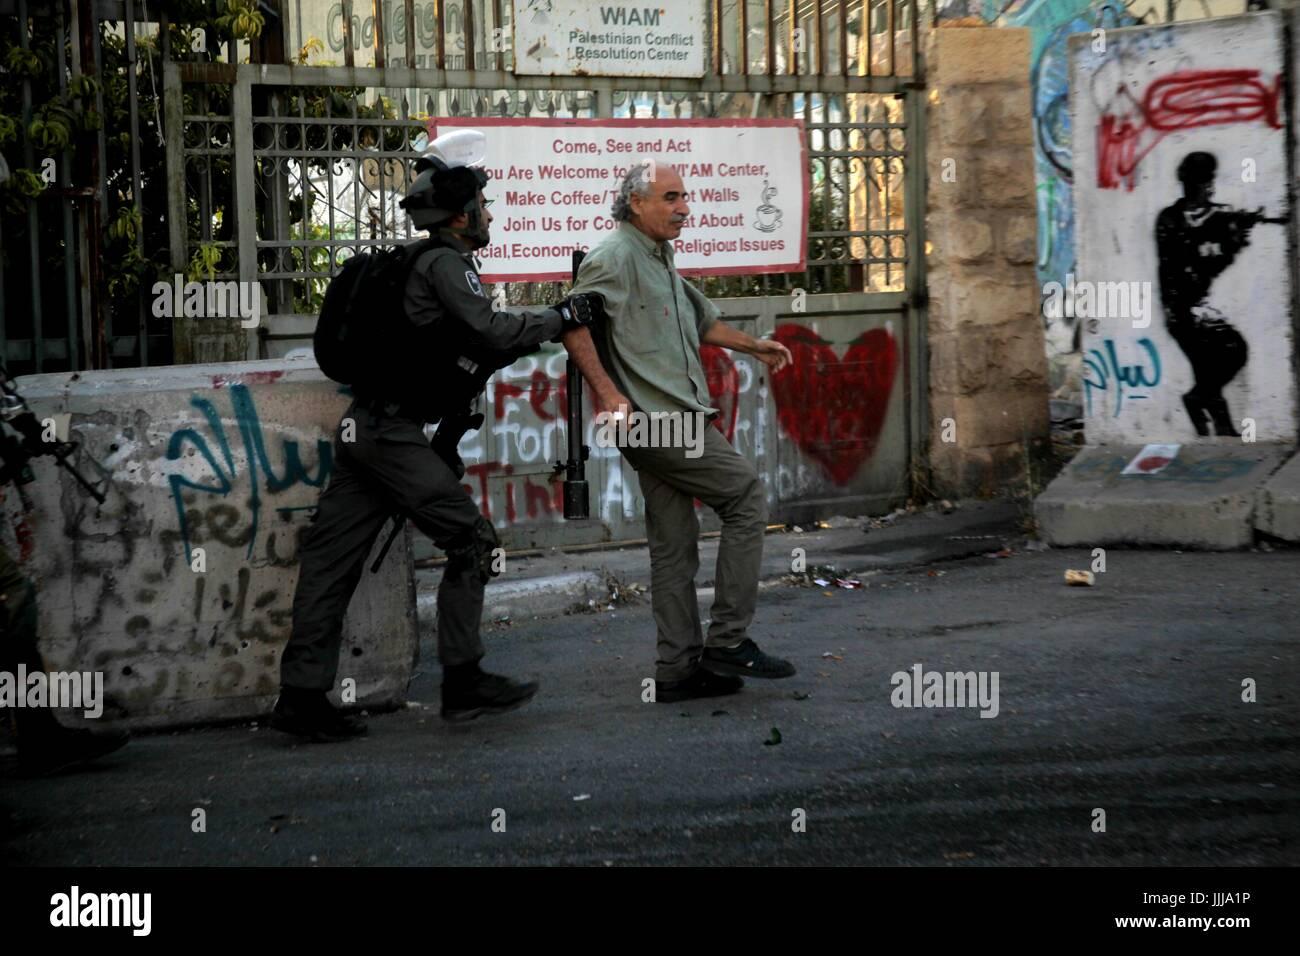 Bethlehem, West Bank city of Bethlehem. 19th July, 2017. An Israeli border policeman detains a Palestinian protester - Stock Image